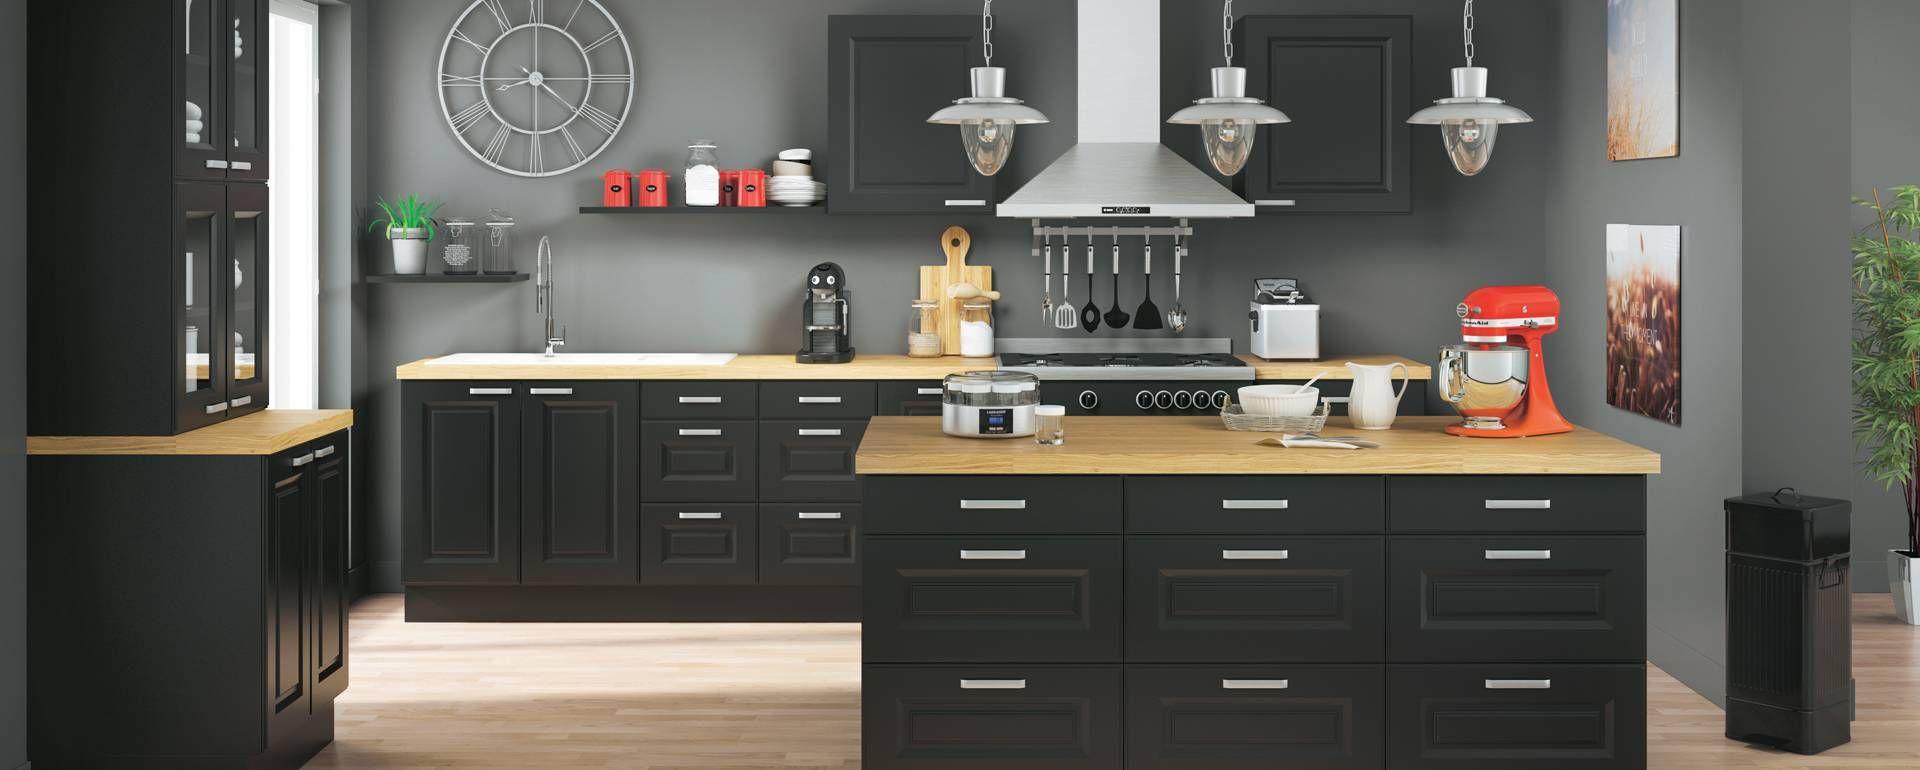 cuisine louise cuisines pinterest cuisine organisations and spaces. Black Bedroom Furniture Sets. Home Design Ideas